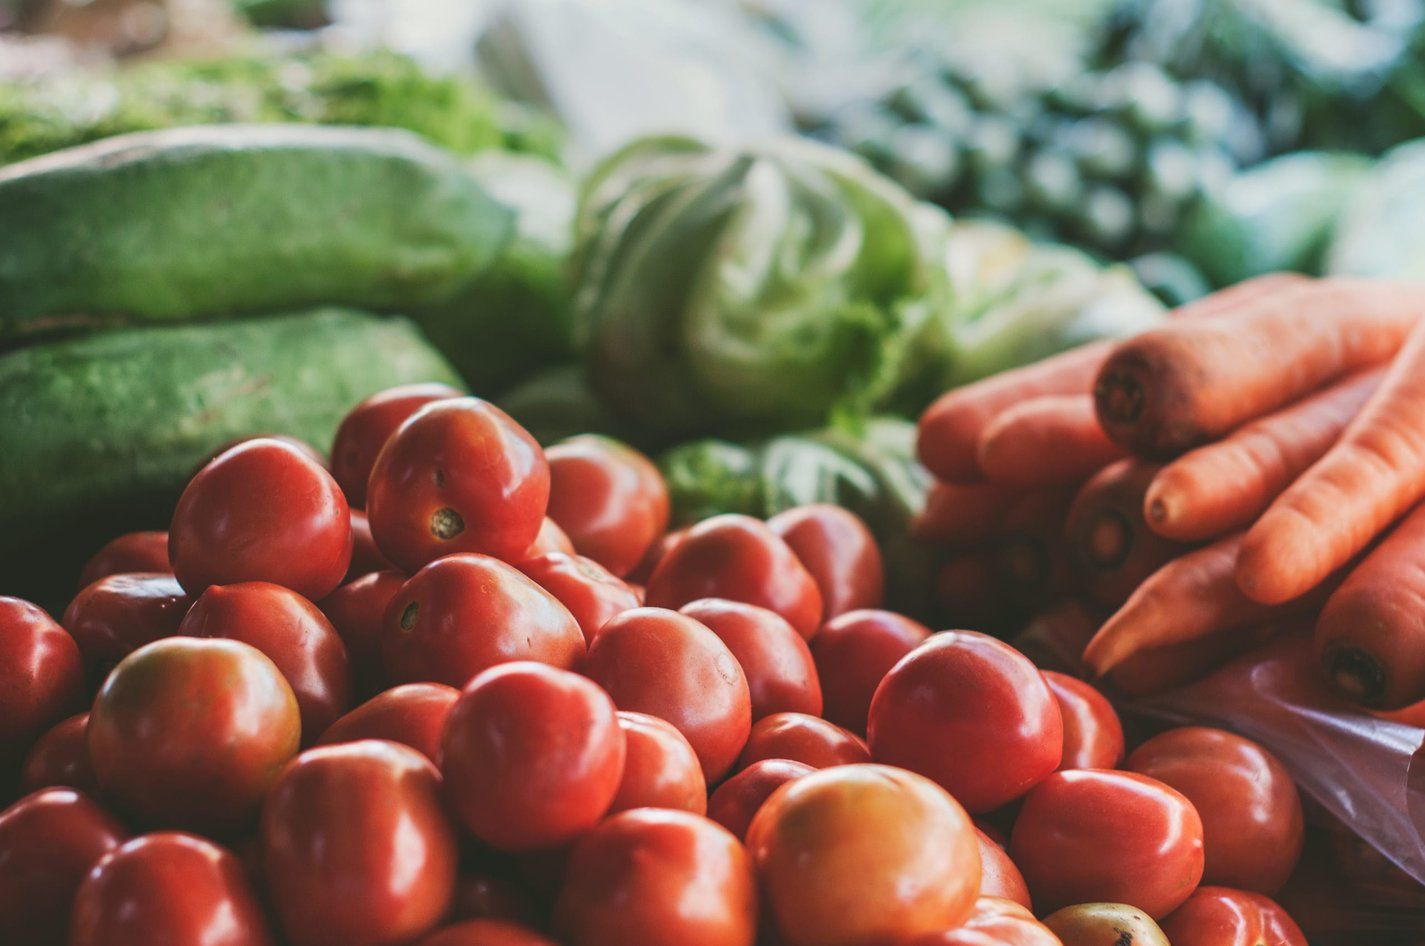 Storing vegetables right